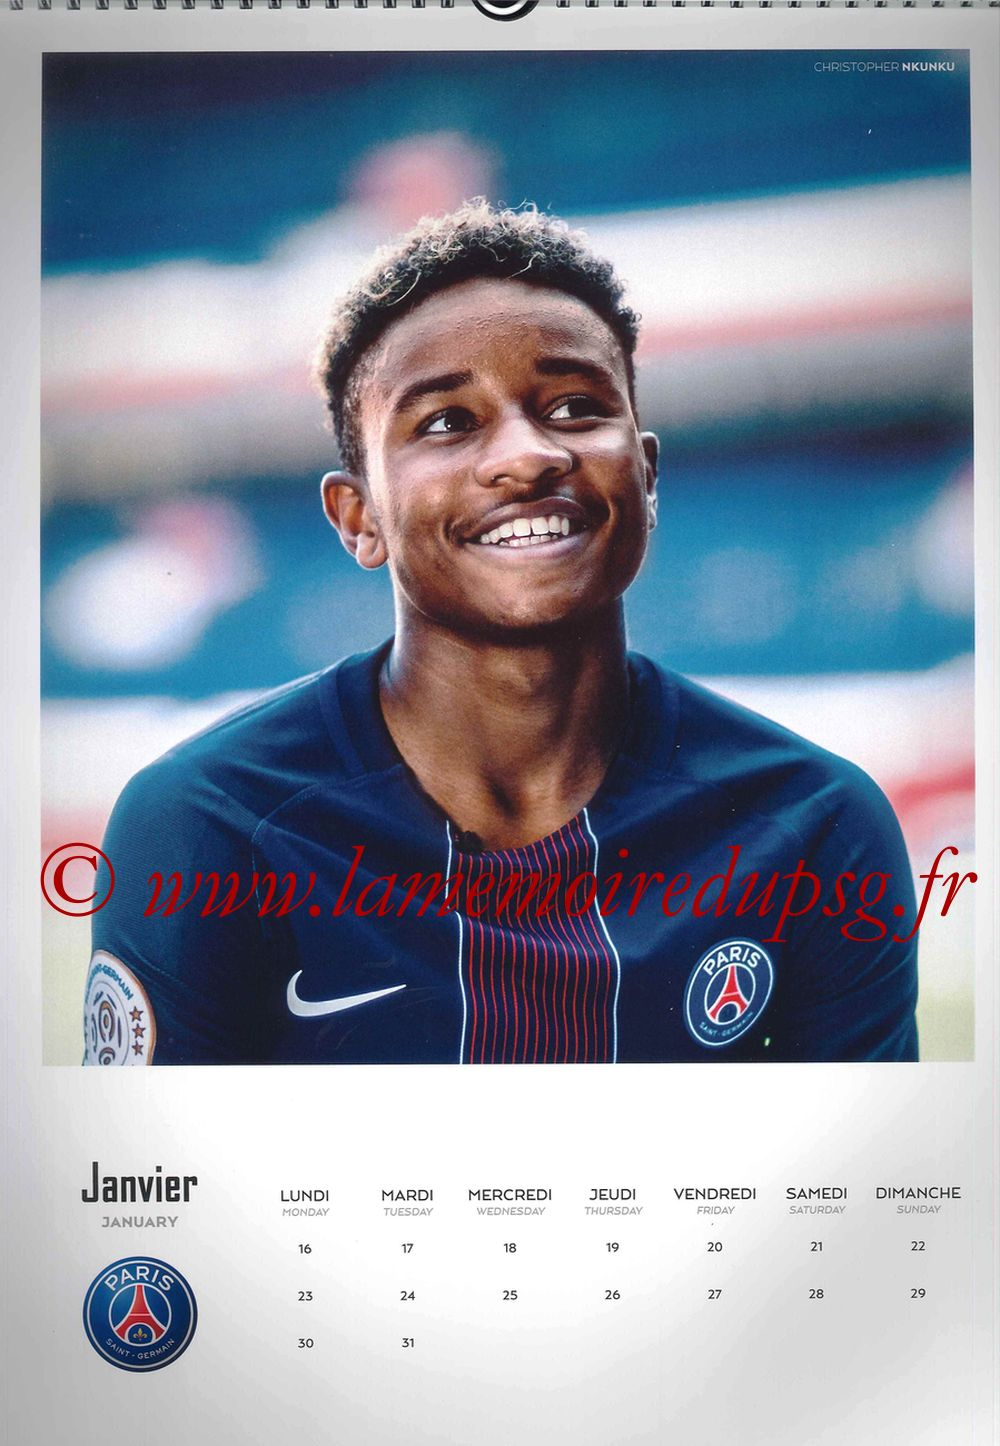 Calendrier PSG 2017 - Page 02 - Christopher NKUNKU